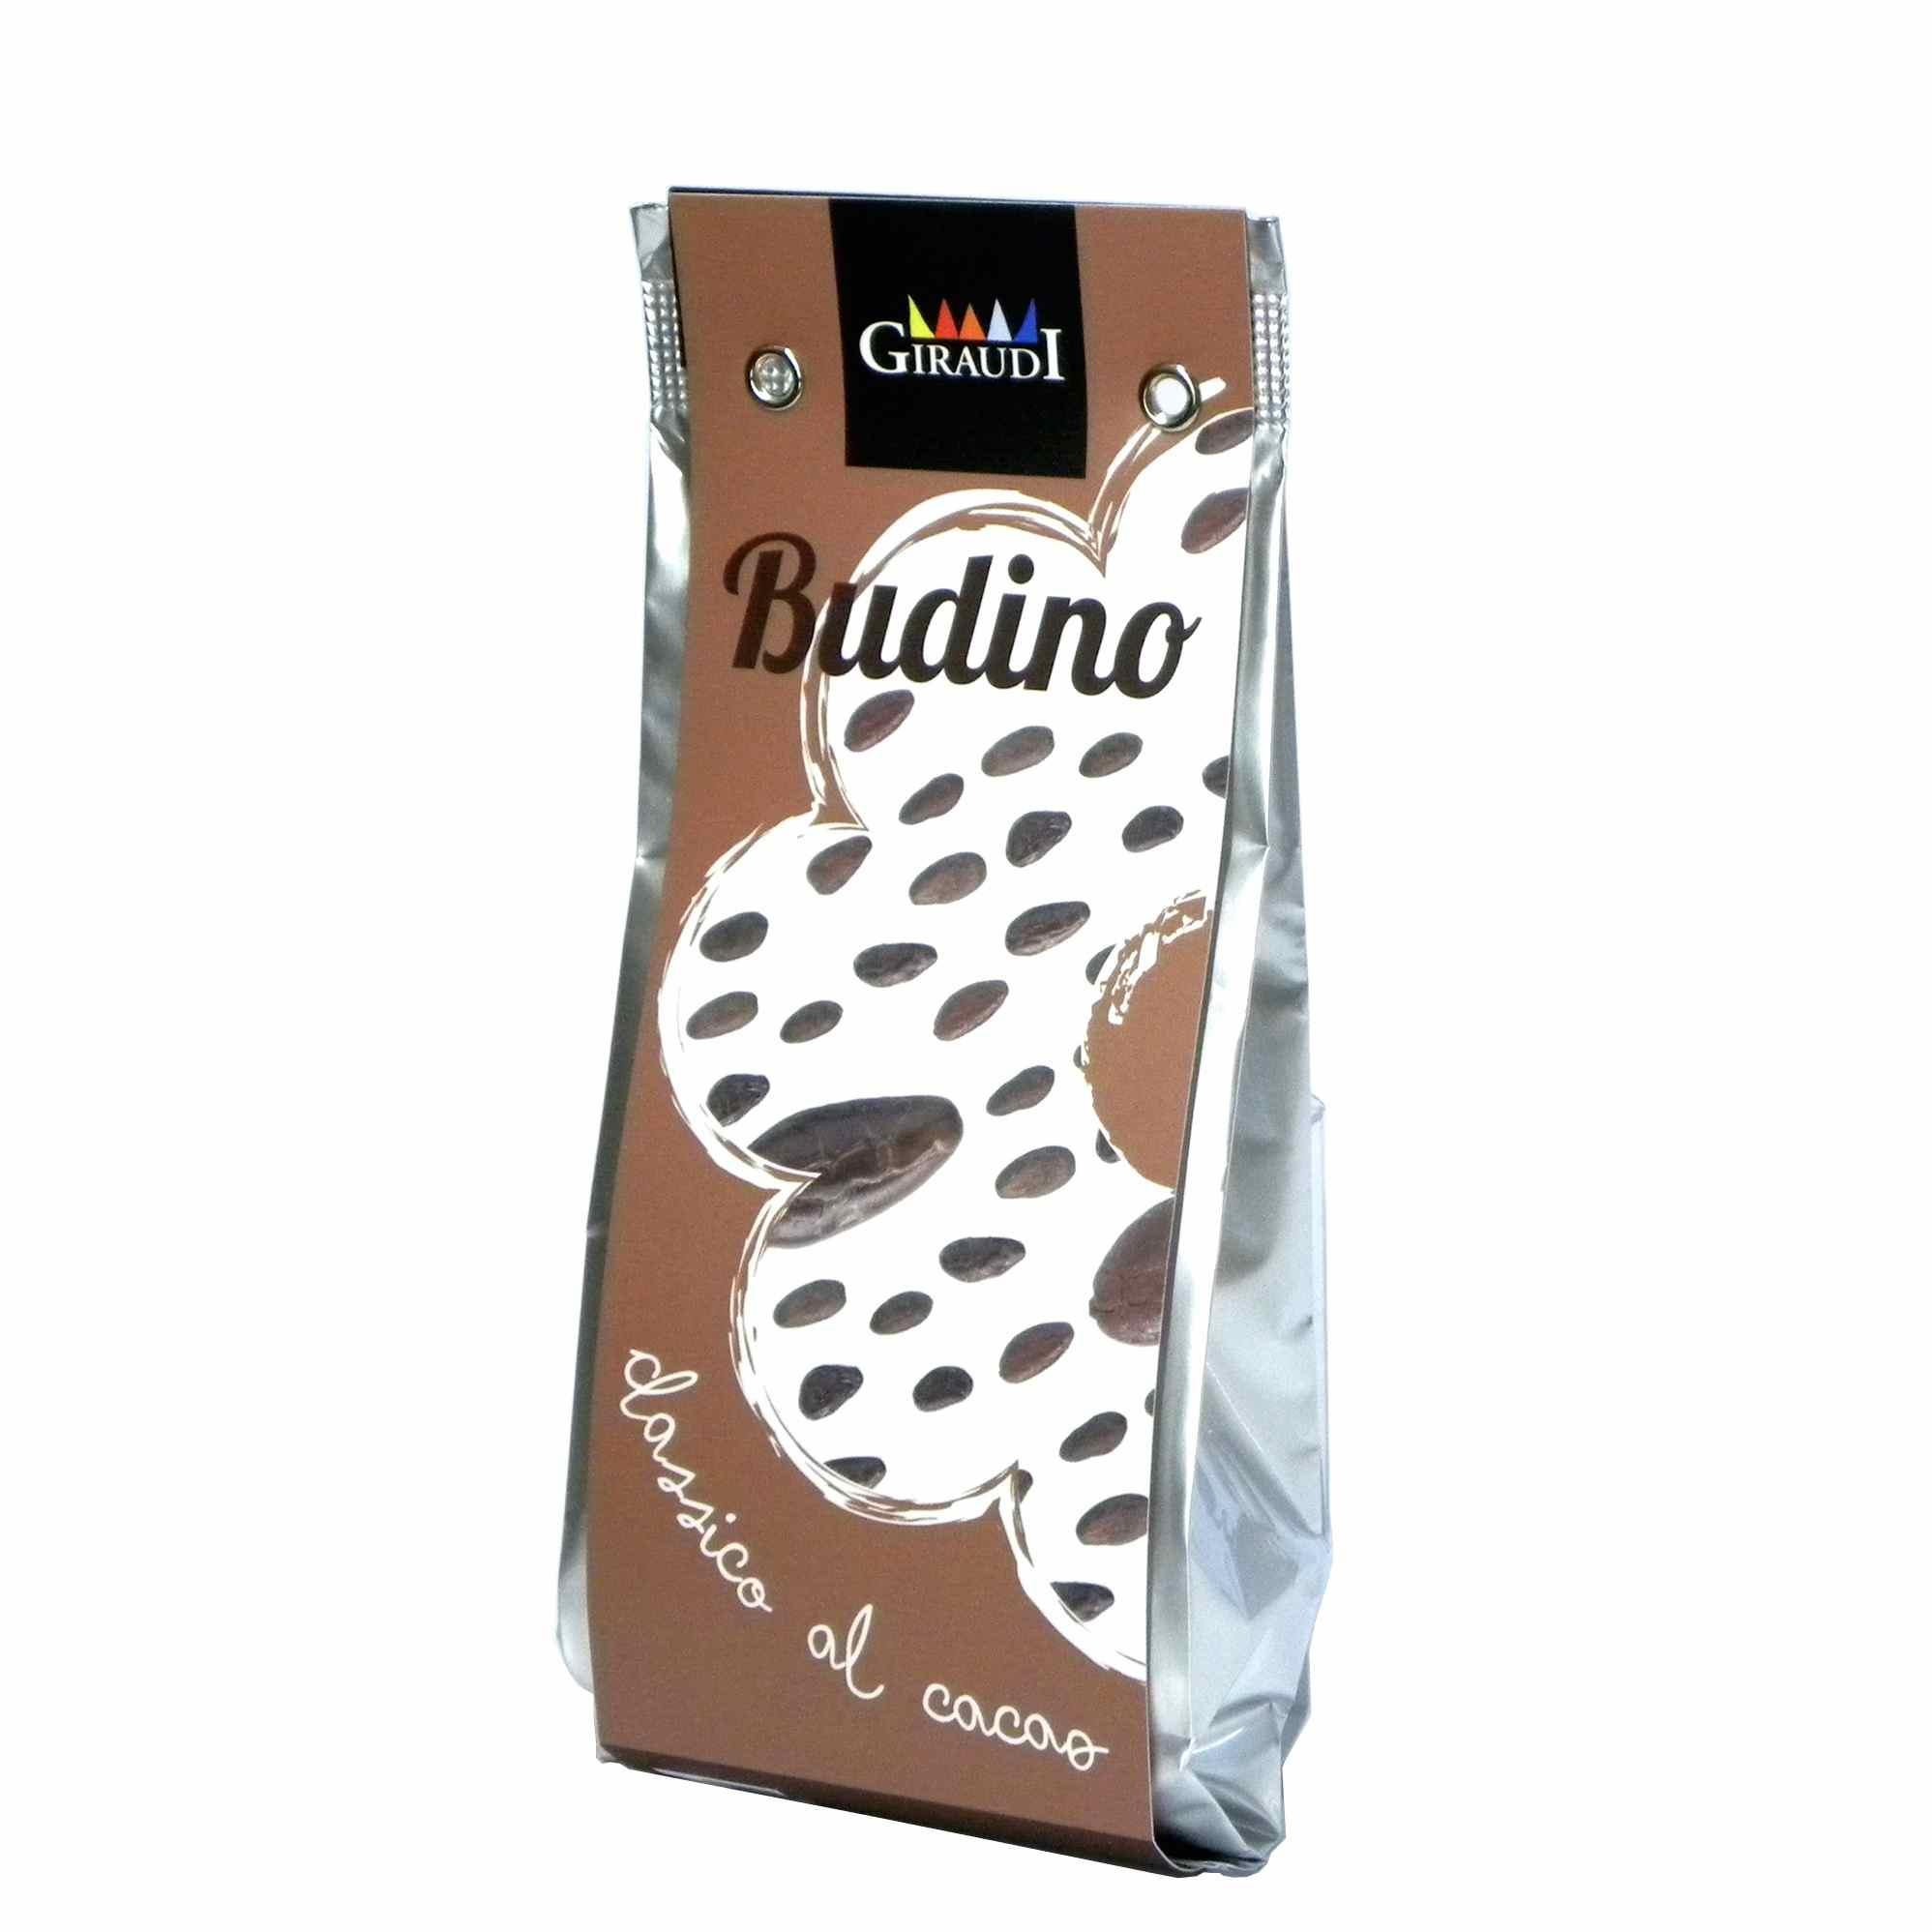 Giraudi budino cacao – Giraudi cocoa pudding – Gustorotondo – Italian food boutique